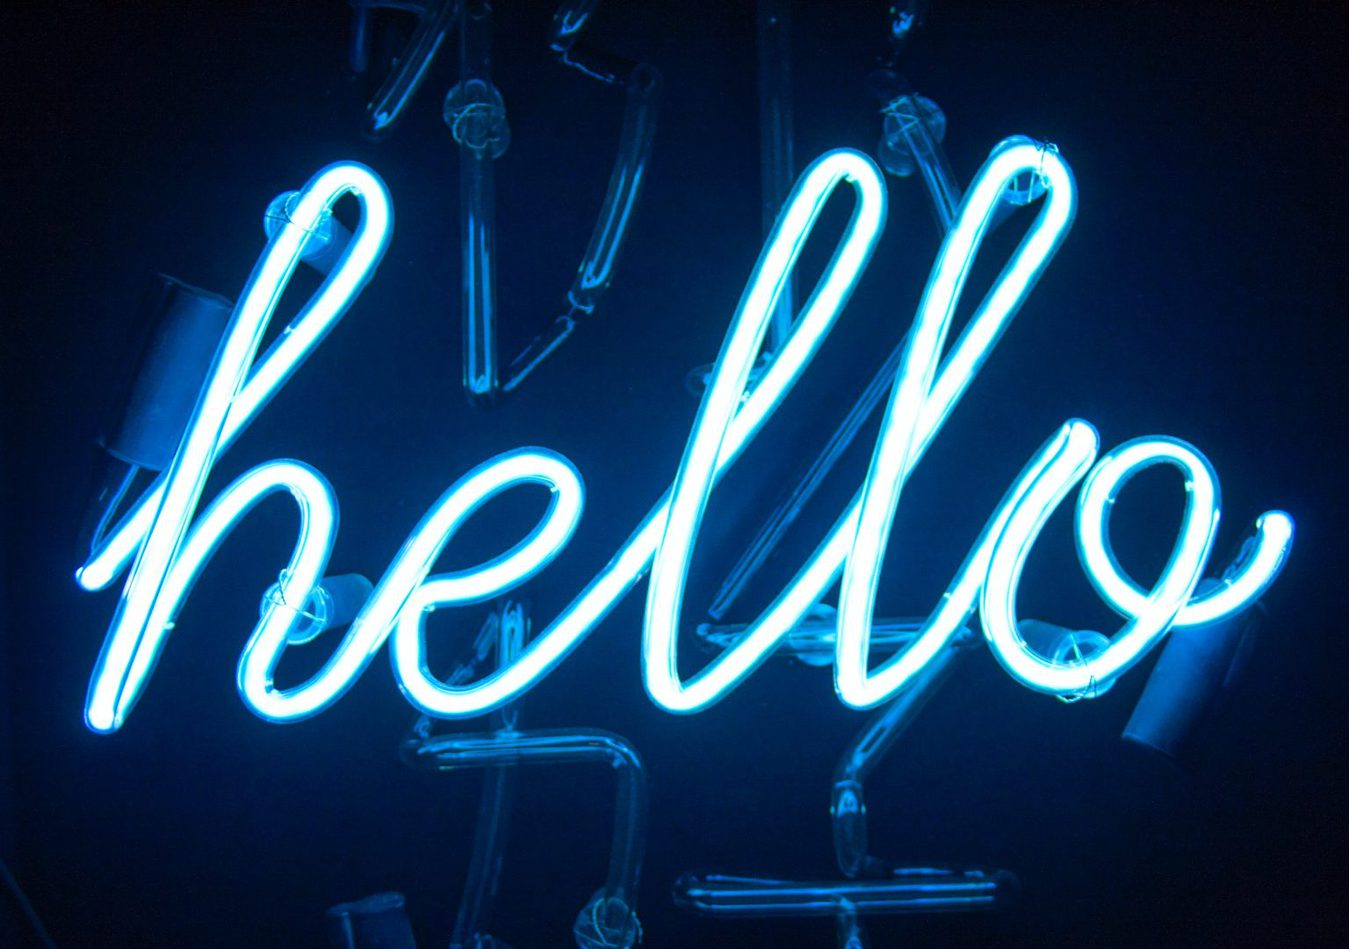 Lampu neon biru bertuliskan Hello